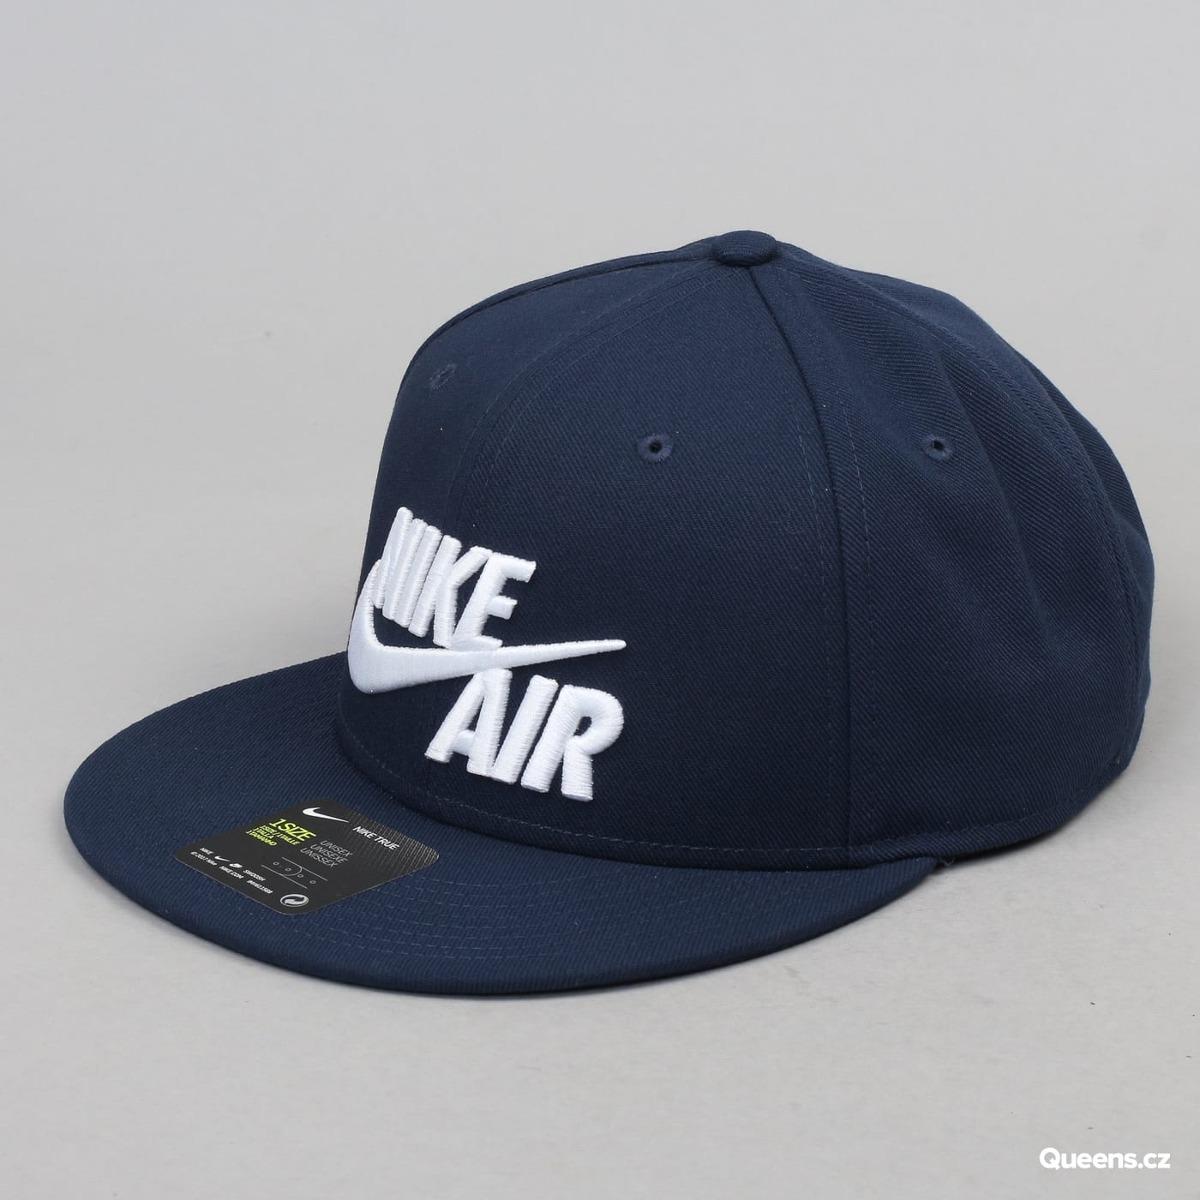 gorra nike air true cap classic snapback plana. Cargando zoom. 9878bcc76c7